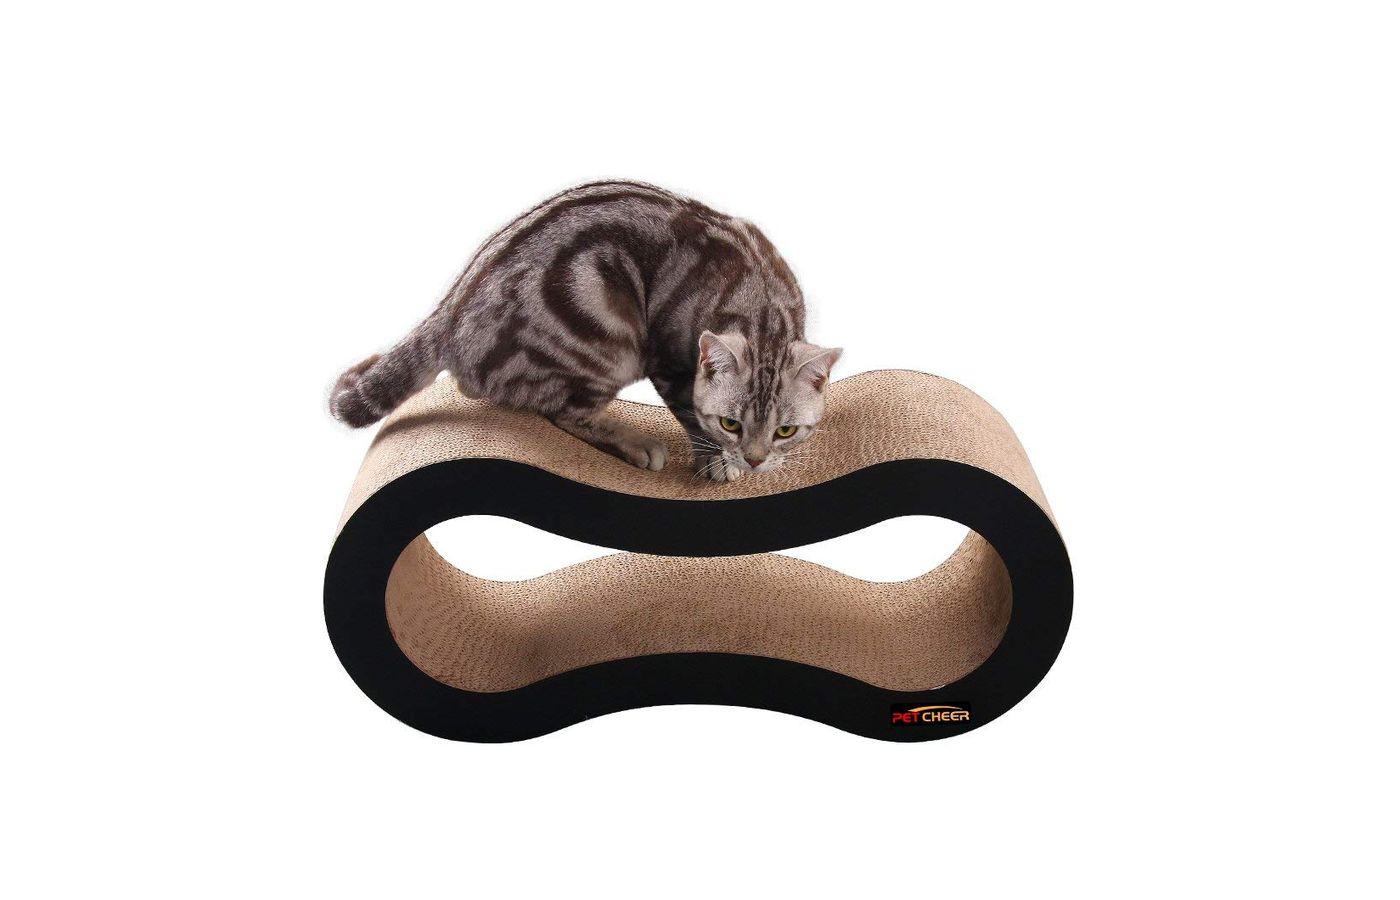 Petcheer Ultimate Cat Scratcher Lounge Bed